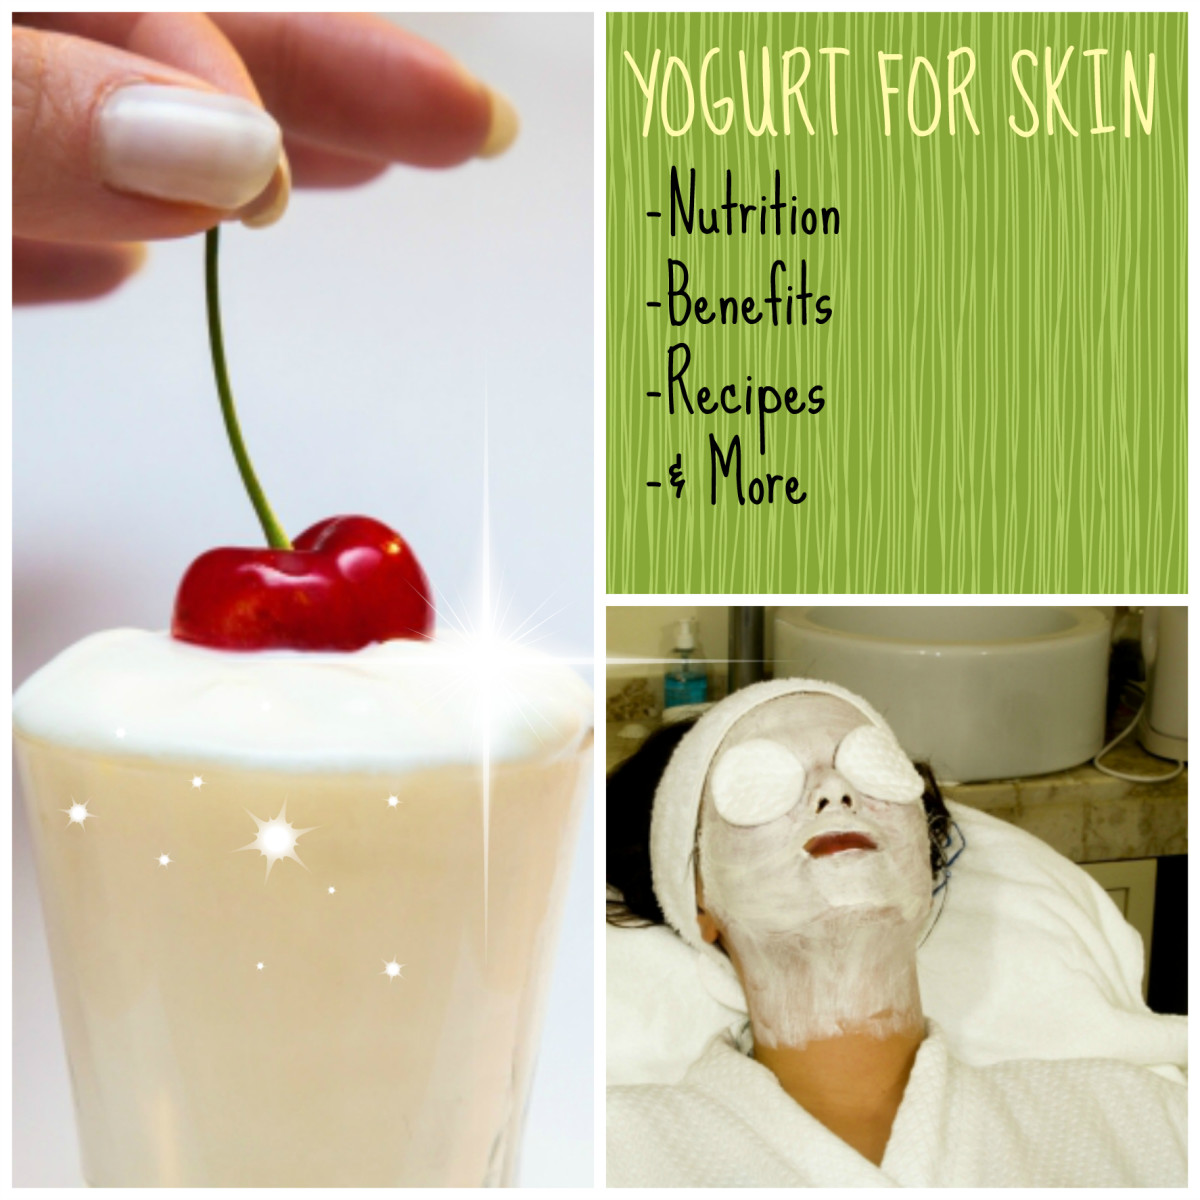 Yogurt for Skin | Powerful Nutrients in Yogurt for Glowing Skin